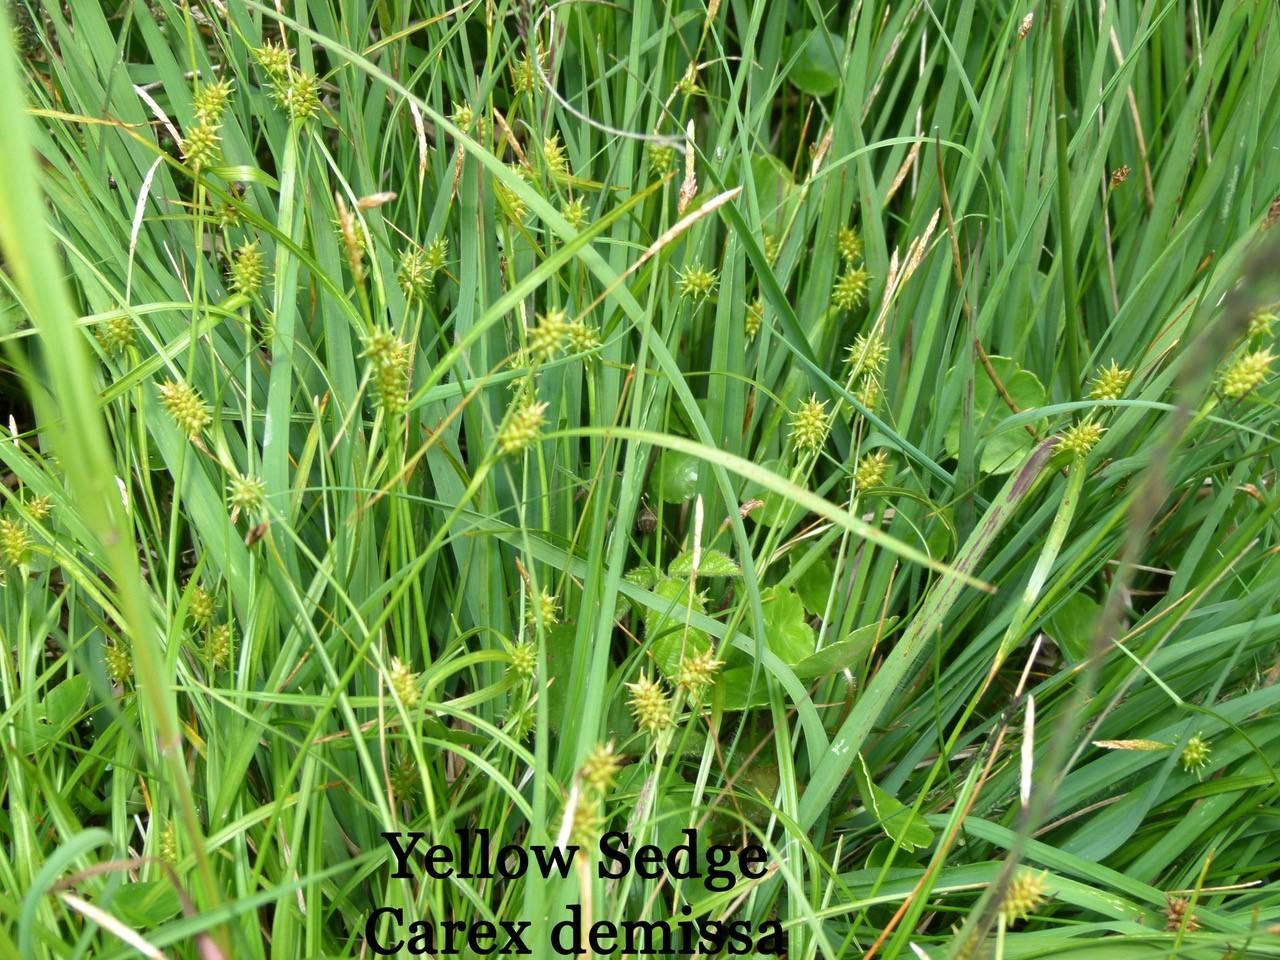 Yellow Sedge (Carex demissa), Malham